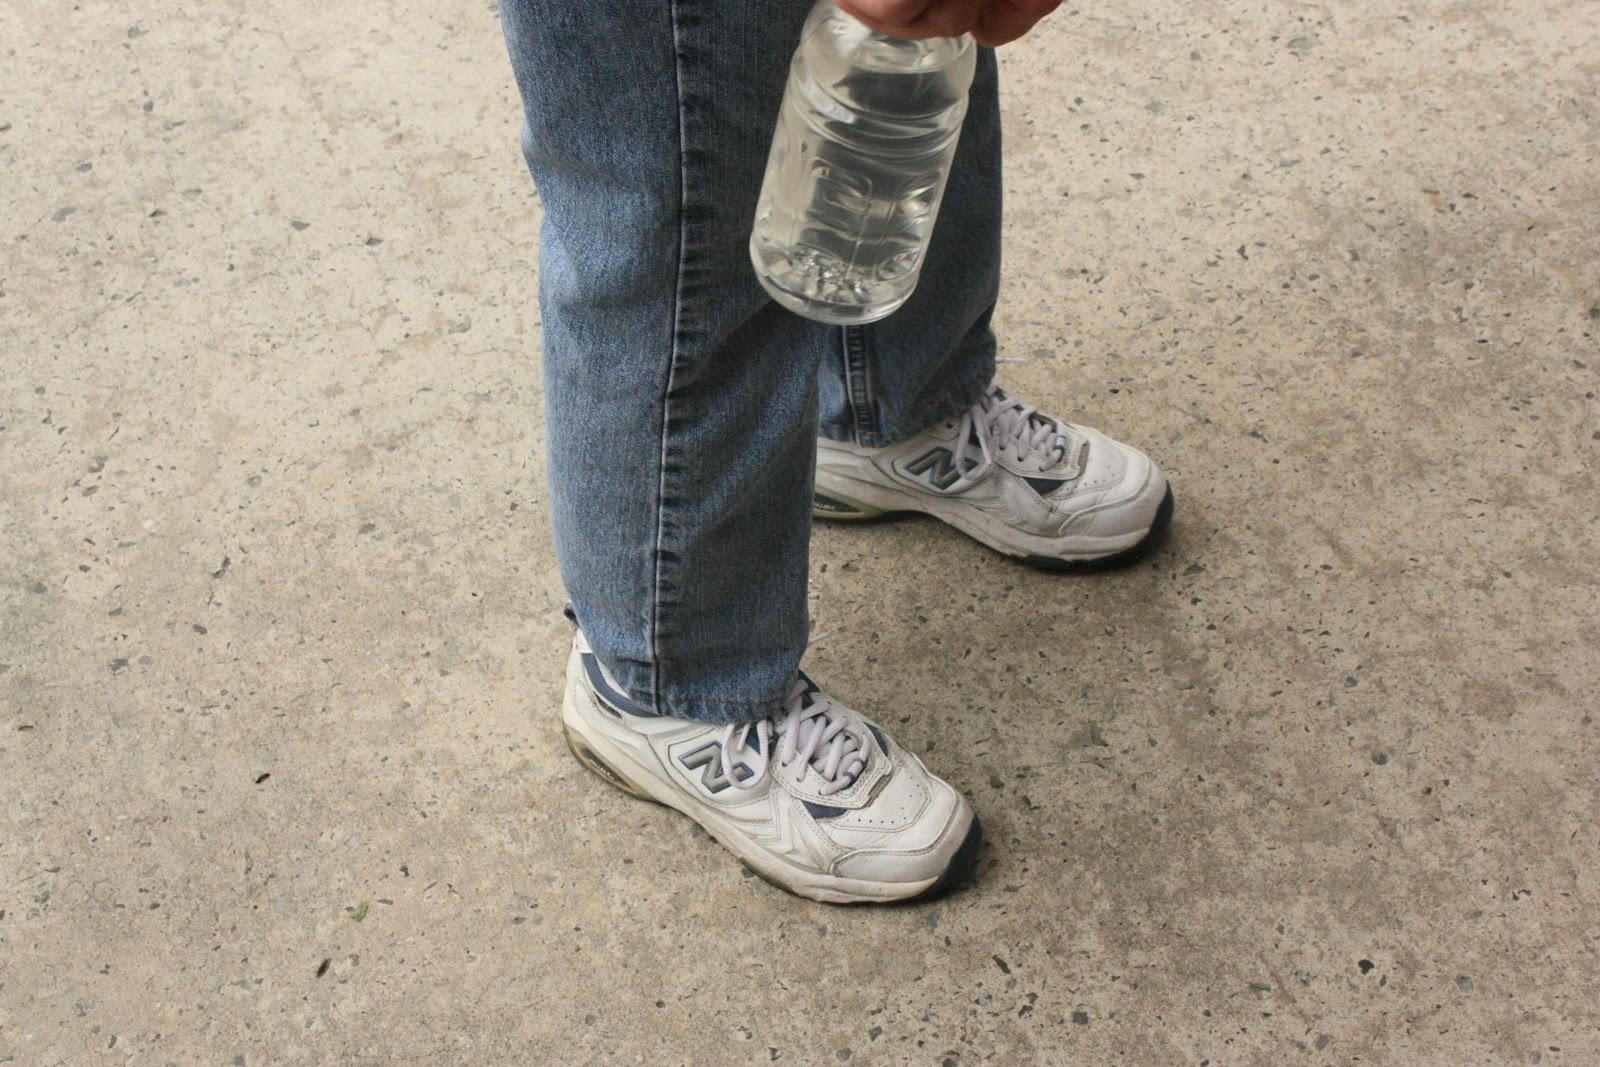 new balance shoes reddit swagbucks apps reddit nfl